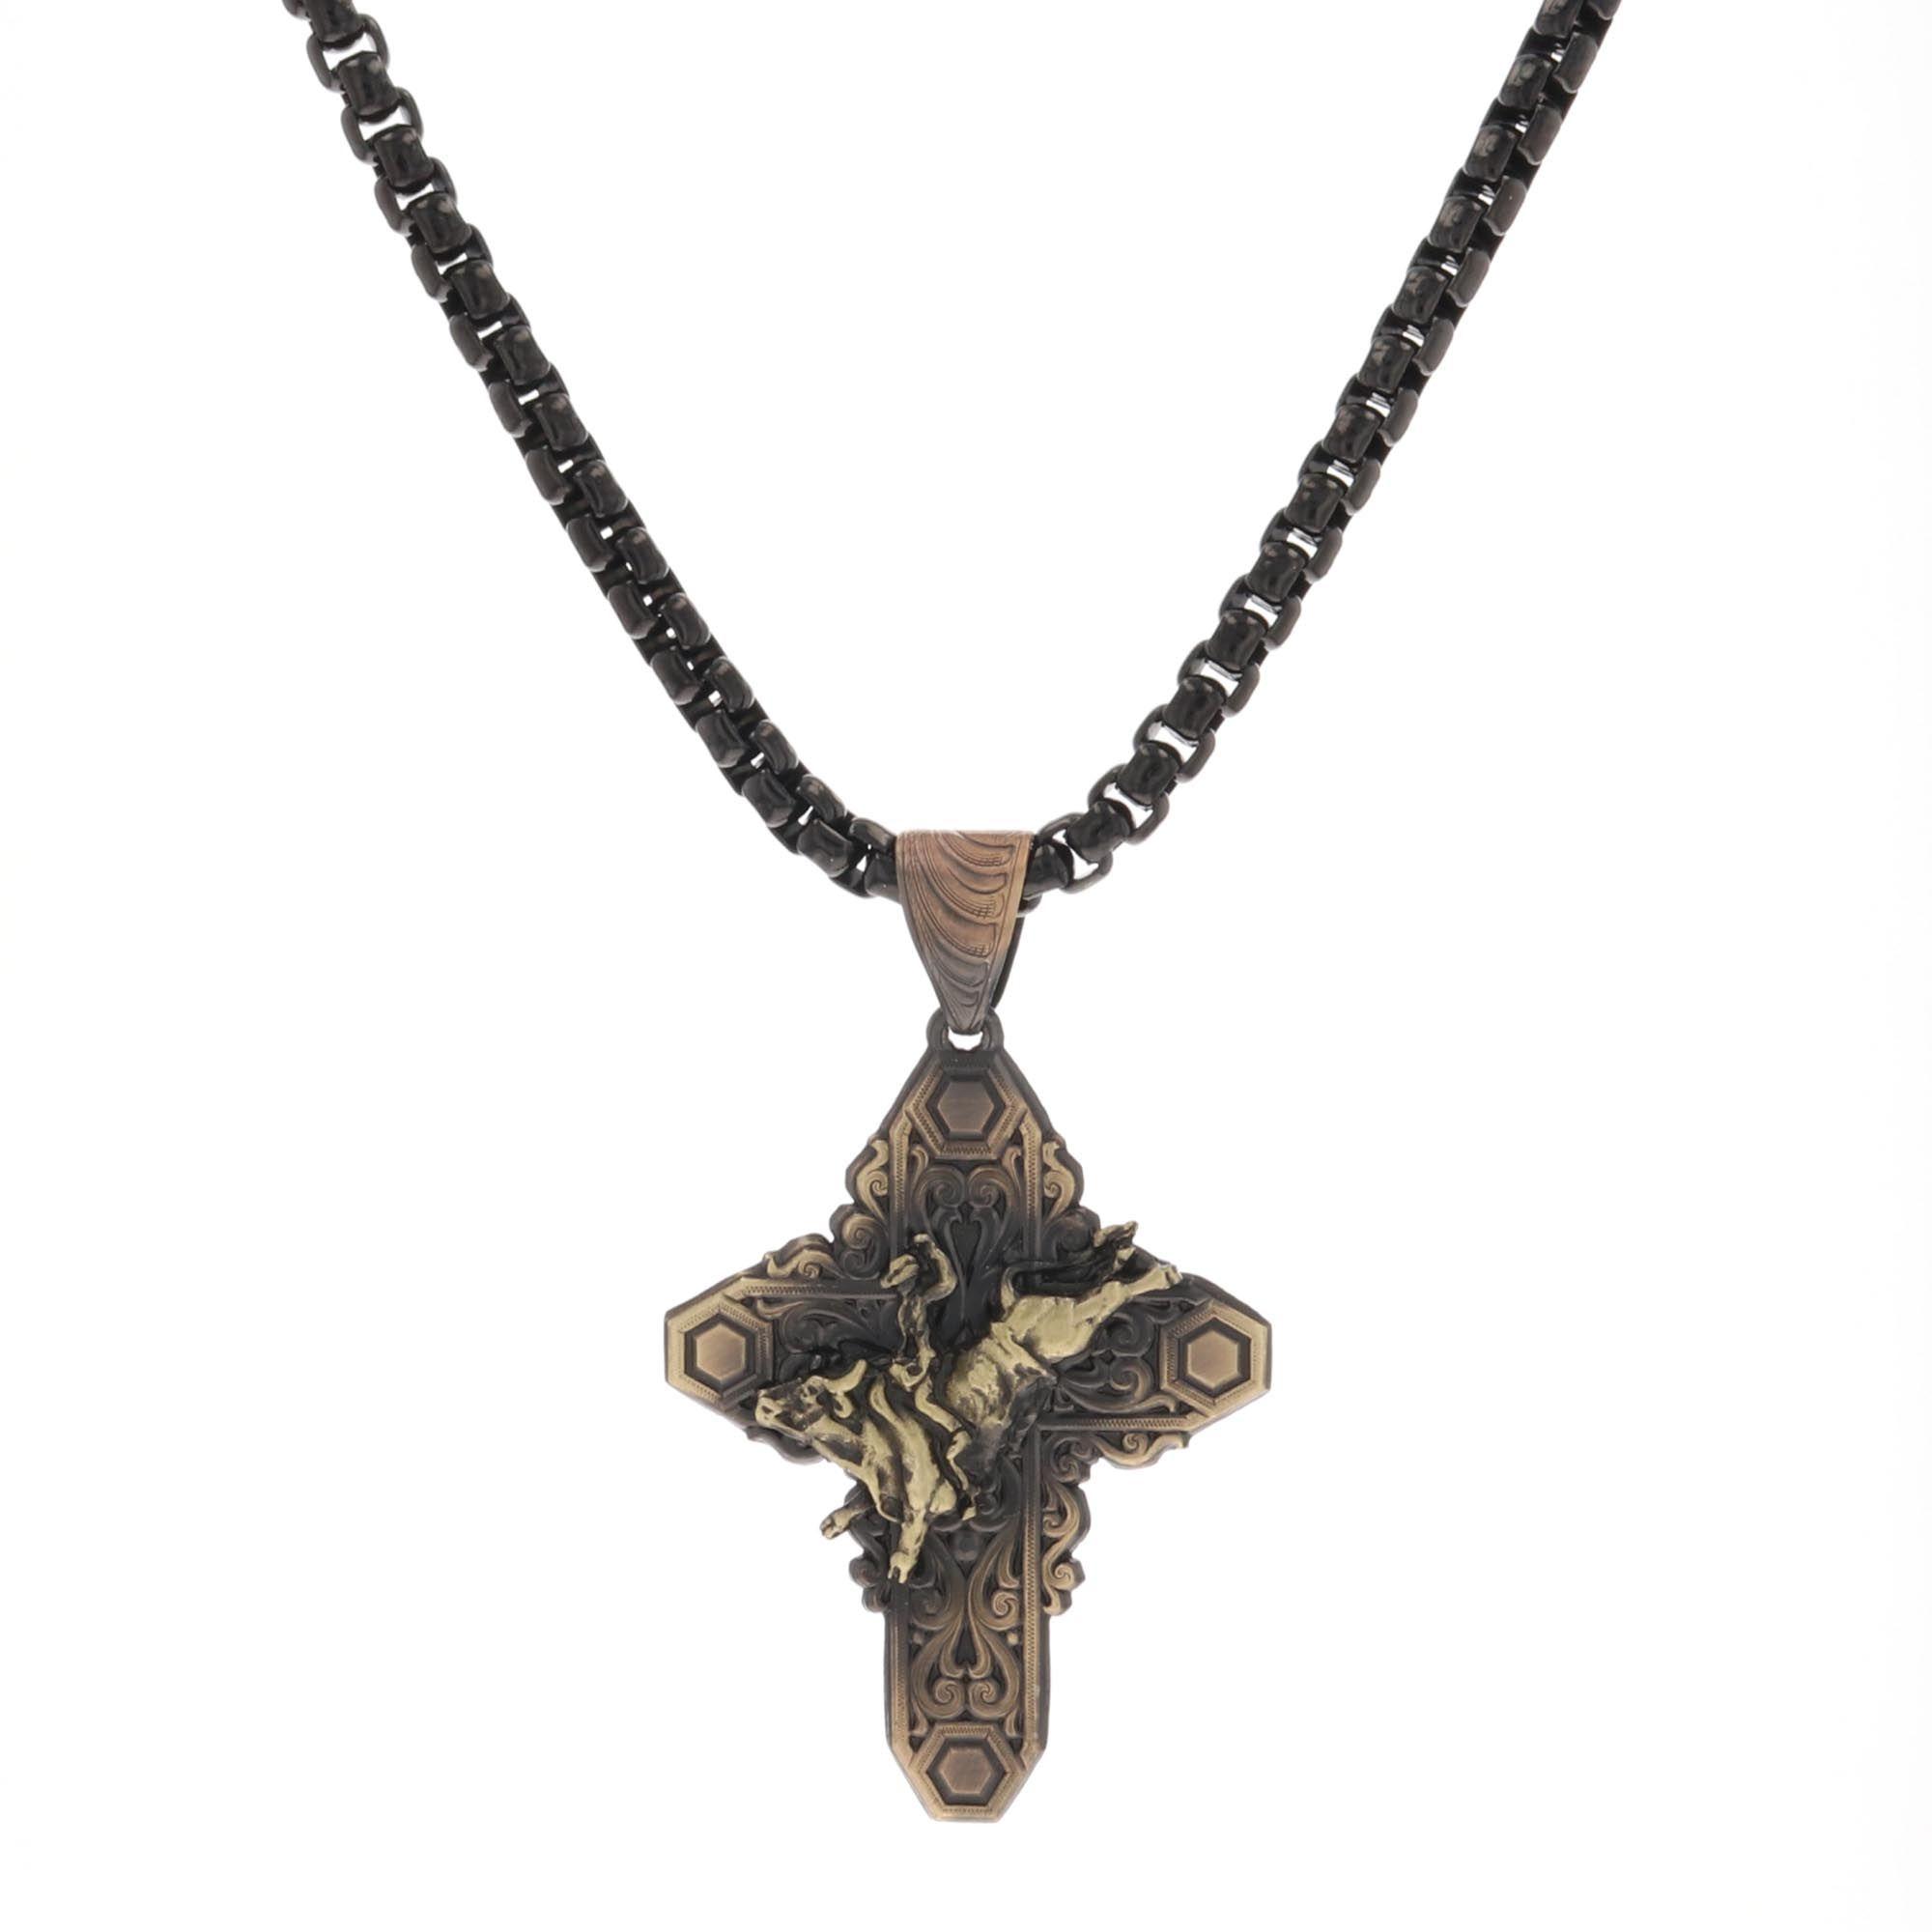 Vintage Bronze Filigree Cross Necklace